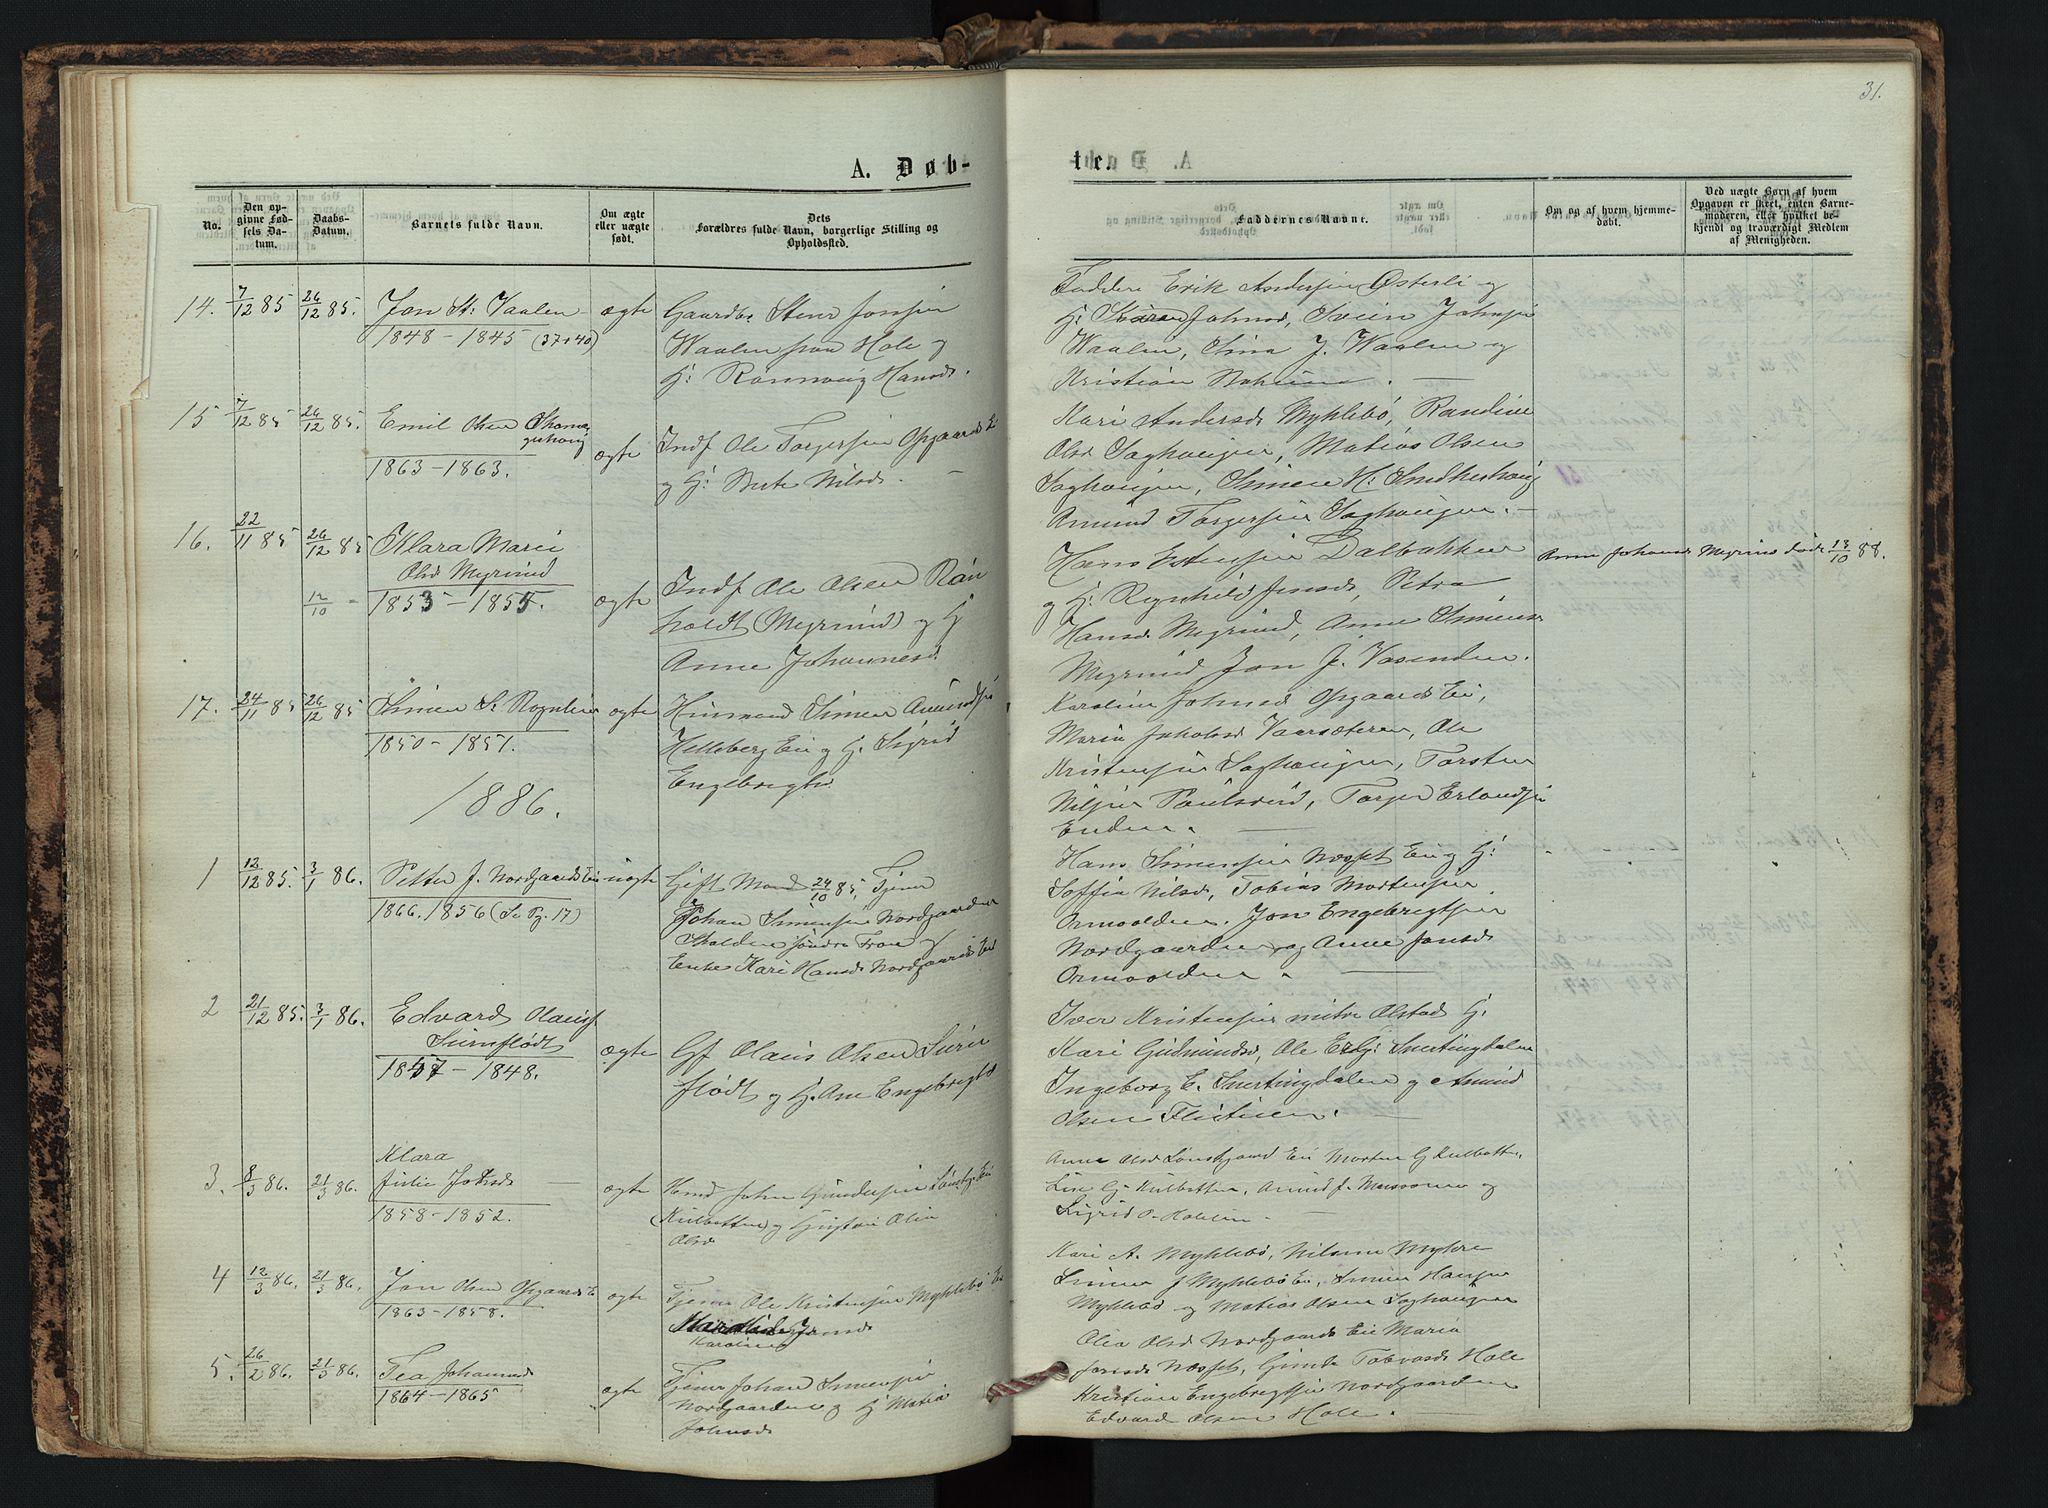 SAH, Vestre Gausdal prestekontor, Klokkerbok nr. 2, 1874-1897, s. 31